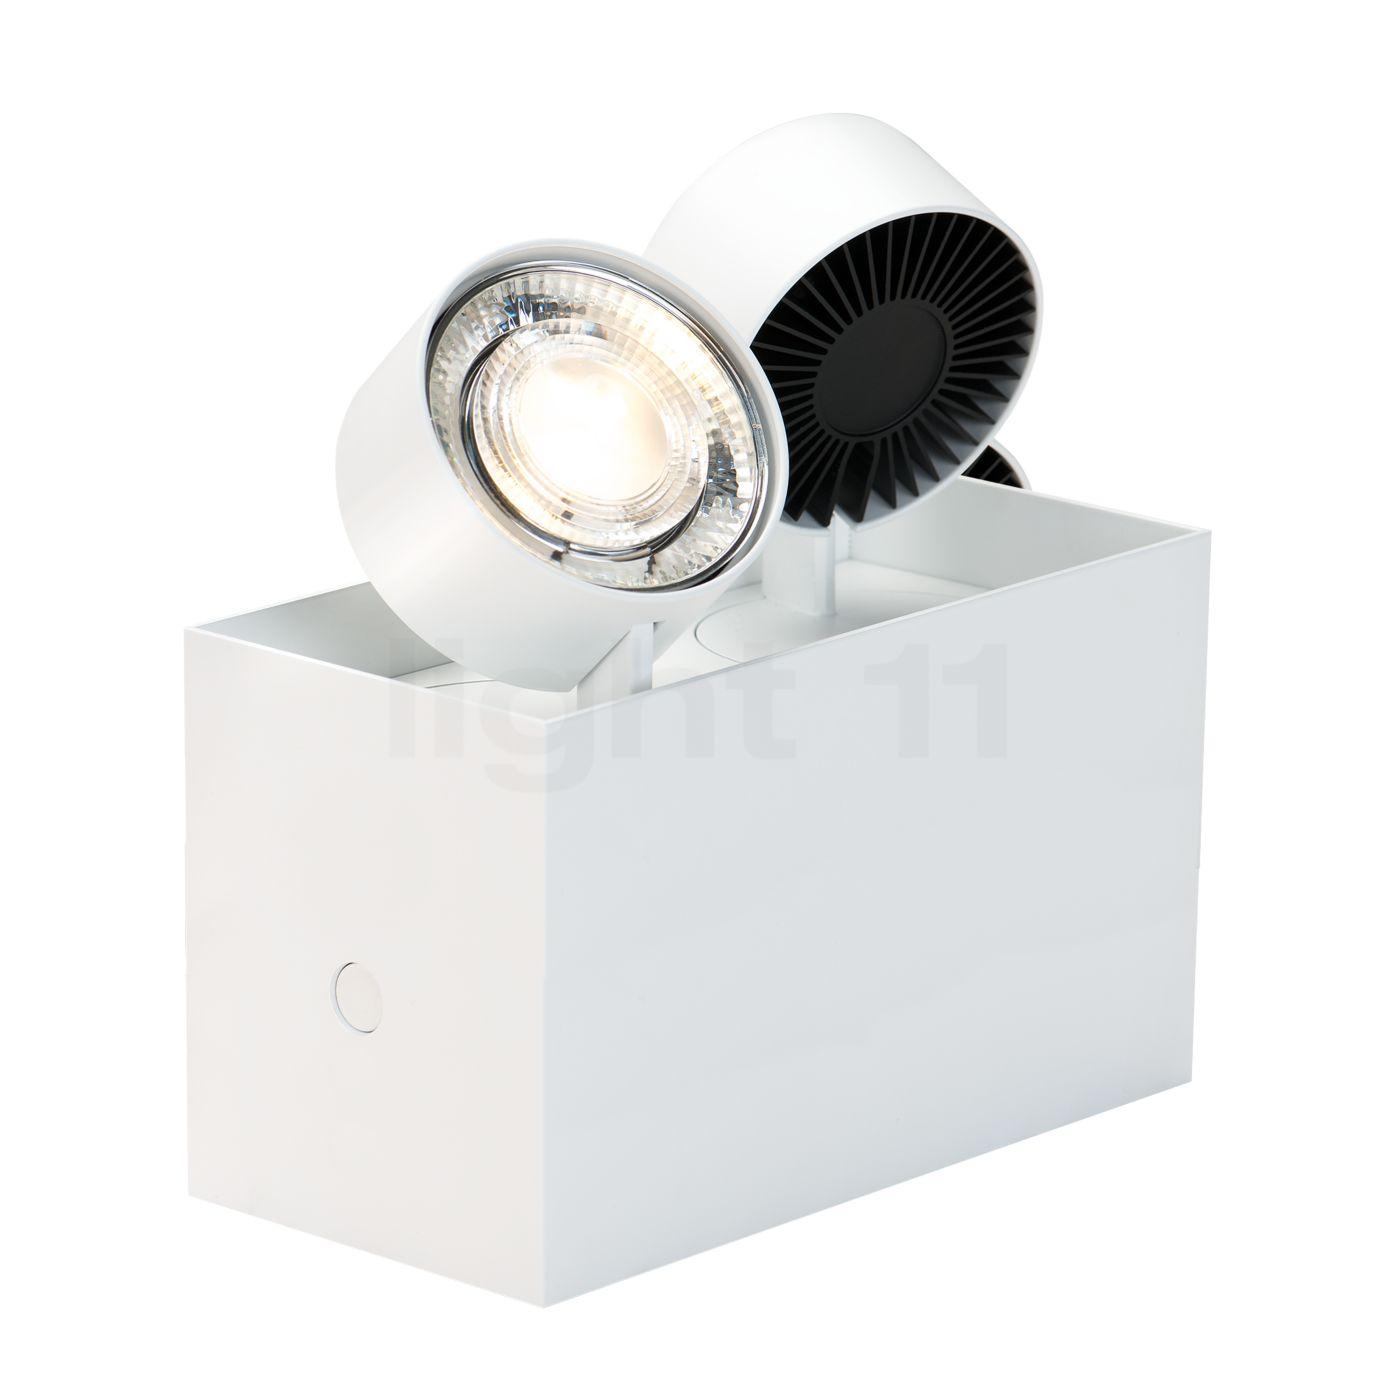 Mawa Wittenberg 4.0 Parkett Bodenleuchte LED, weiß wi4-bod-2e-hb-9016